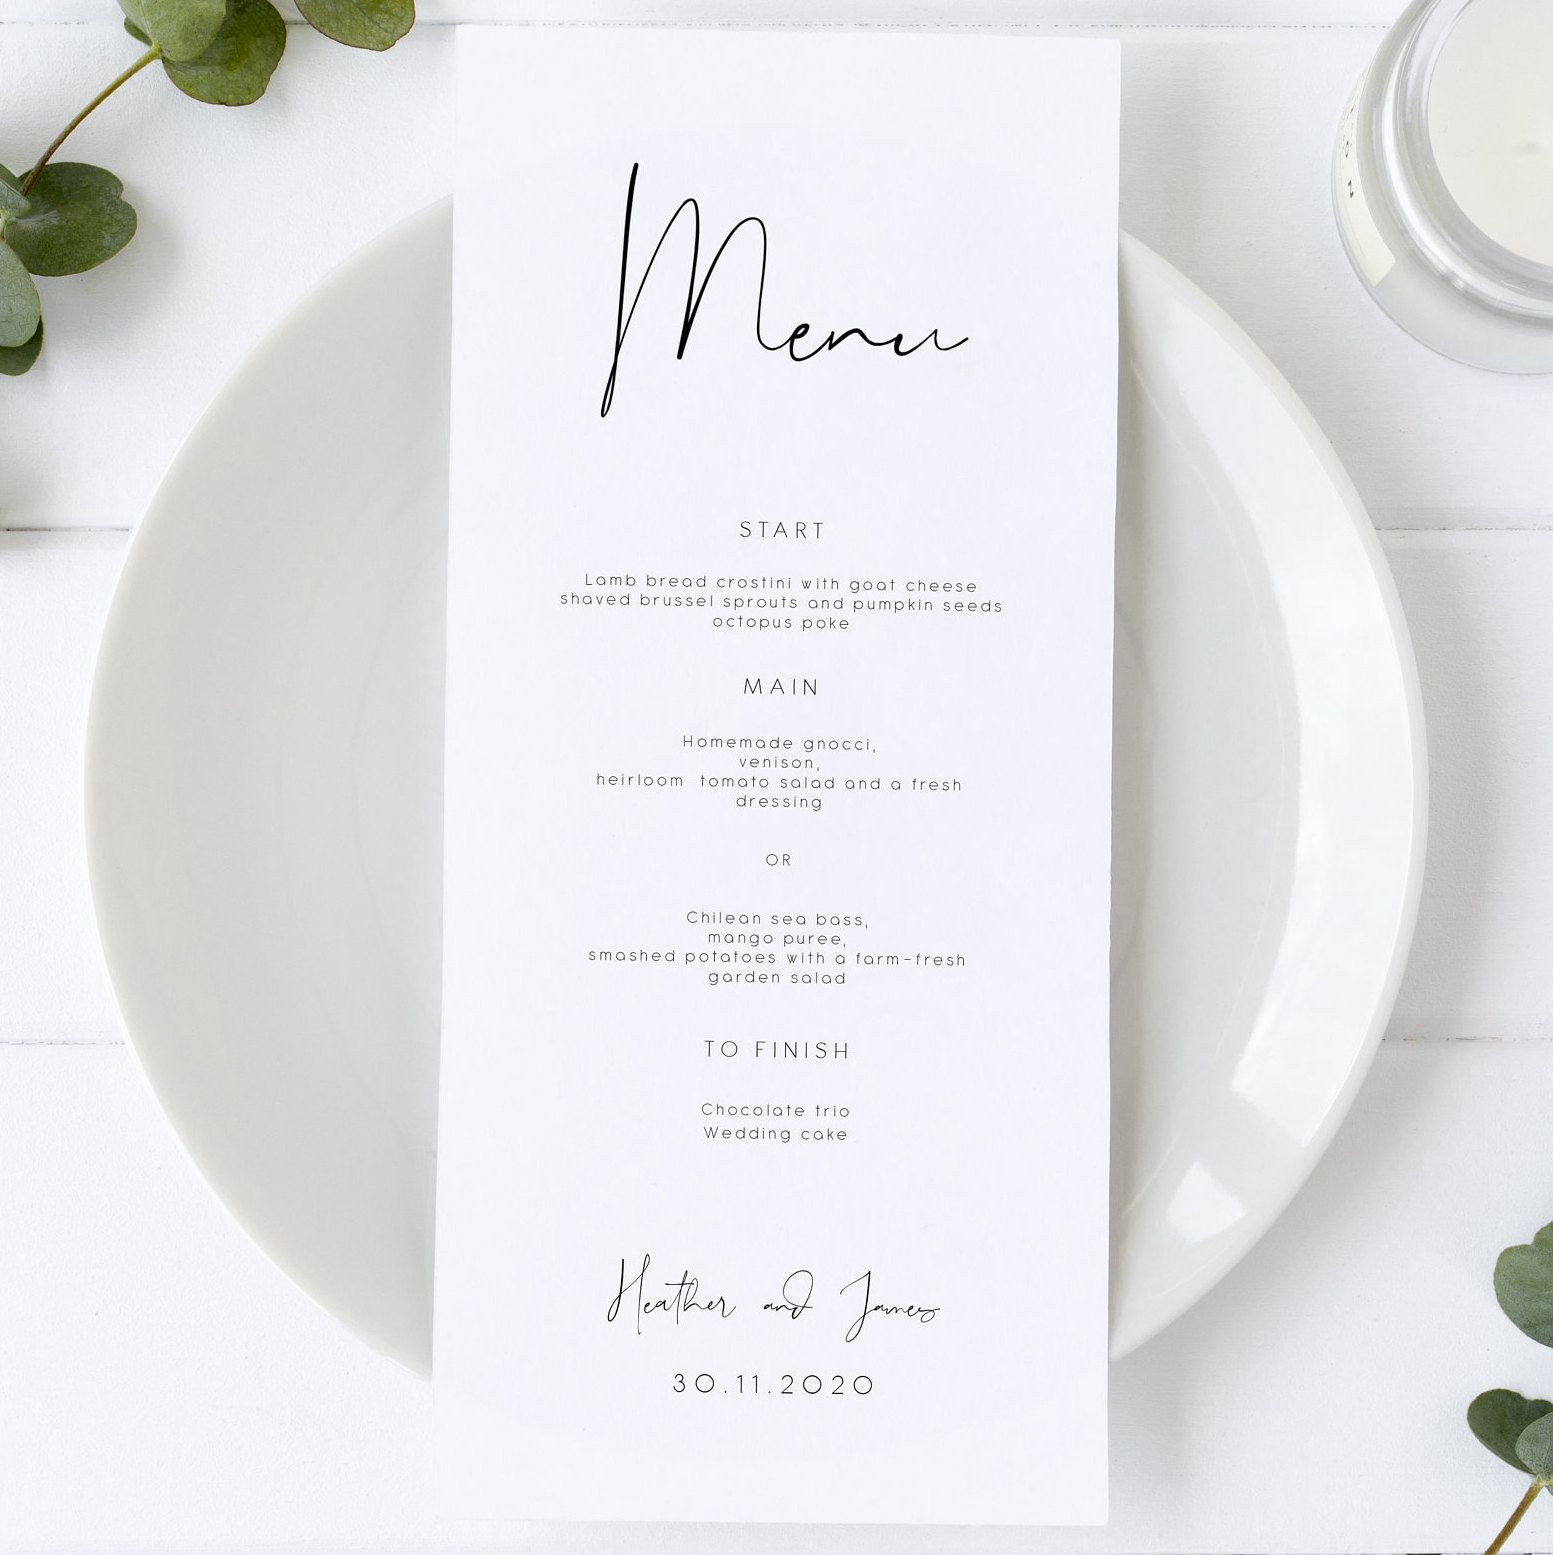 Minimal Wedding Menu Template, Minimalist Wedding Menu, Modern Wedding Menu, Let's Eat Menu, Templett Wedding Menu 120